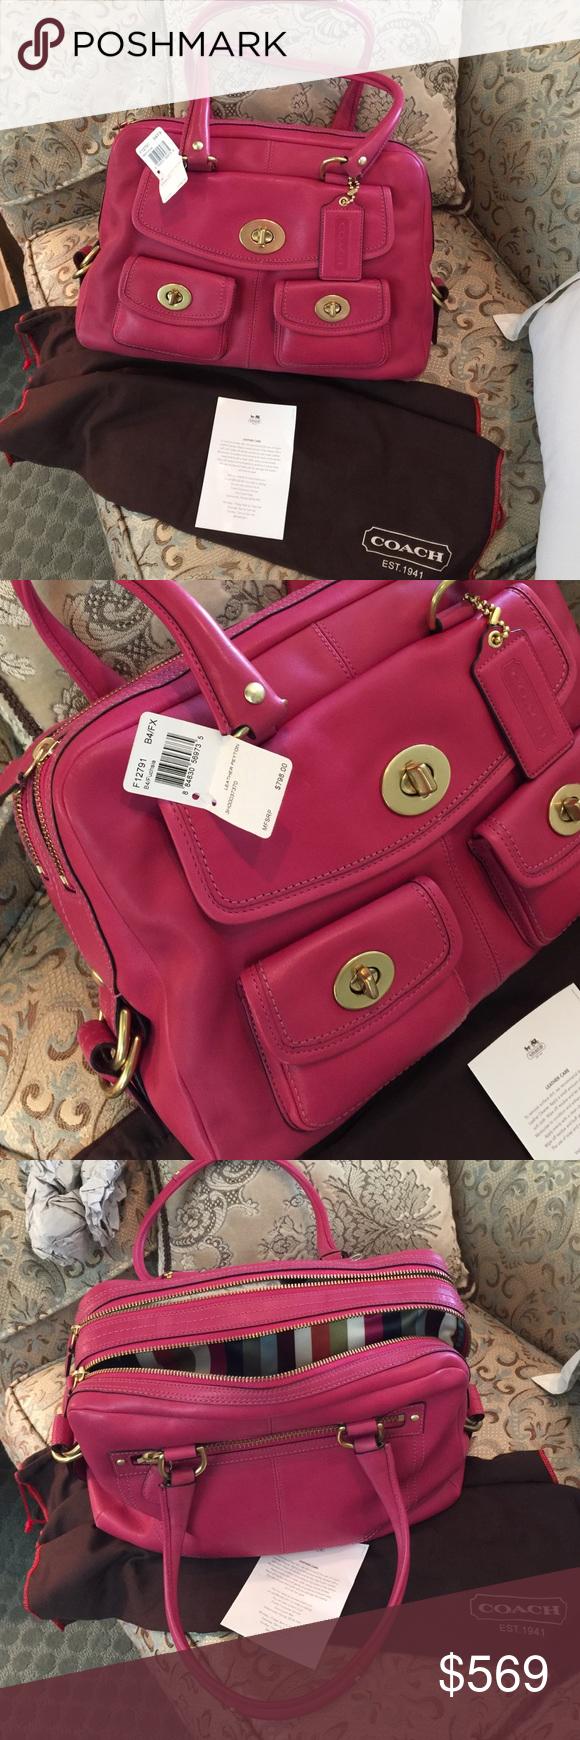 922aed9aca1 Spotted while shopping on Poshmark  Coach All Leather Peyton!  poshmark   fashion  shopping  style  Coach  Handbags